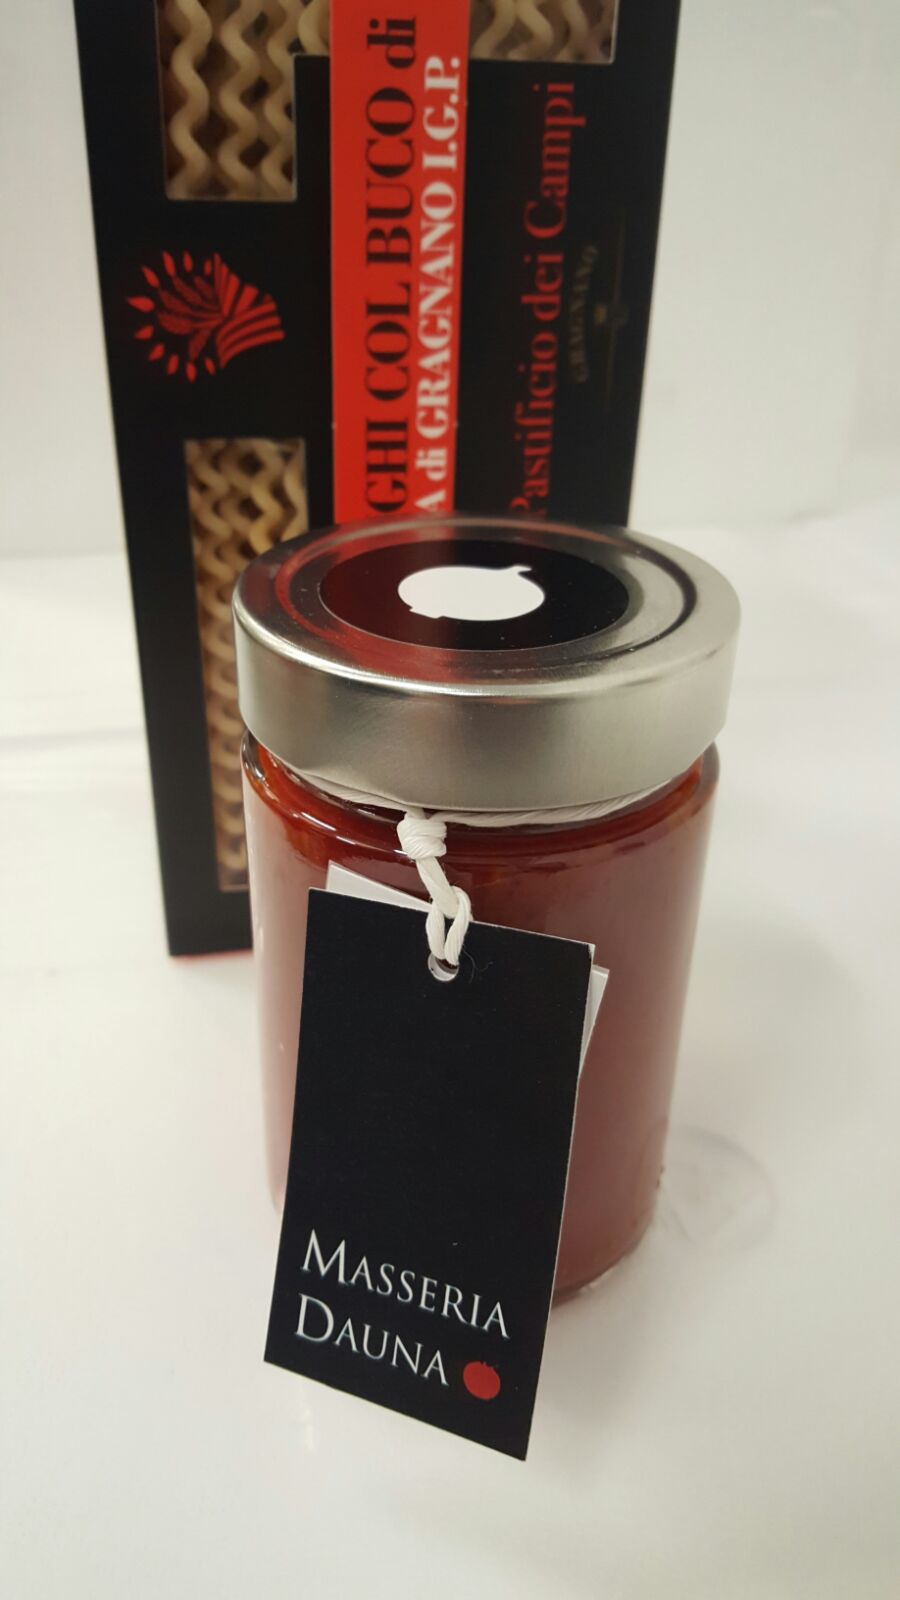 Onion sauce - Masseria Dauna